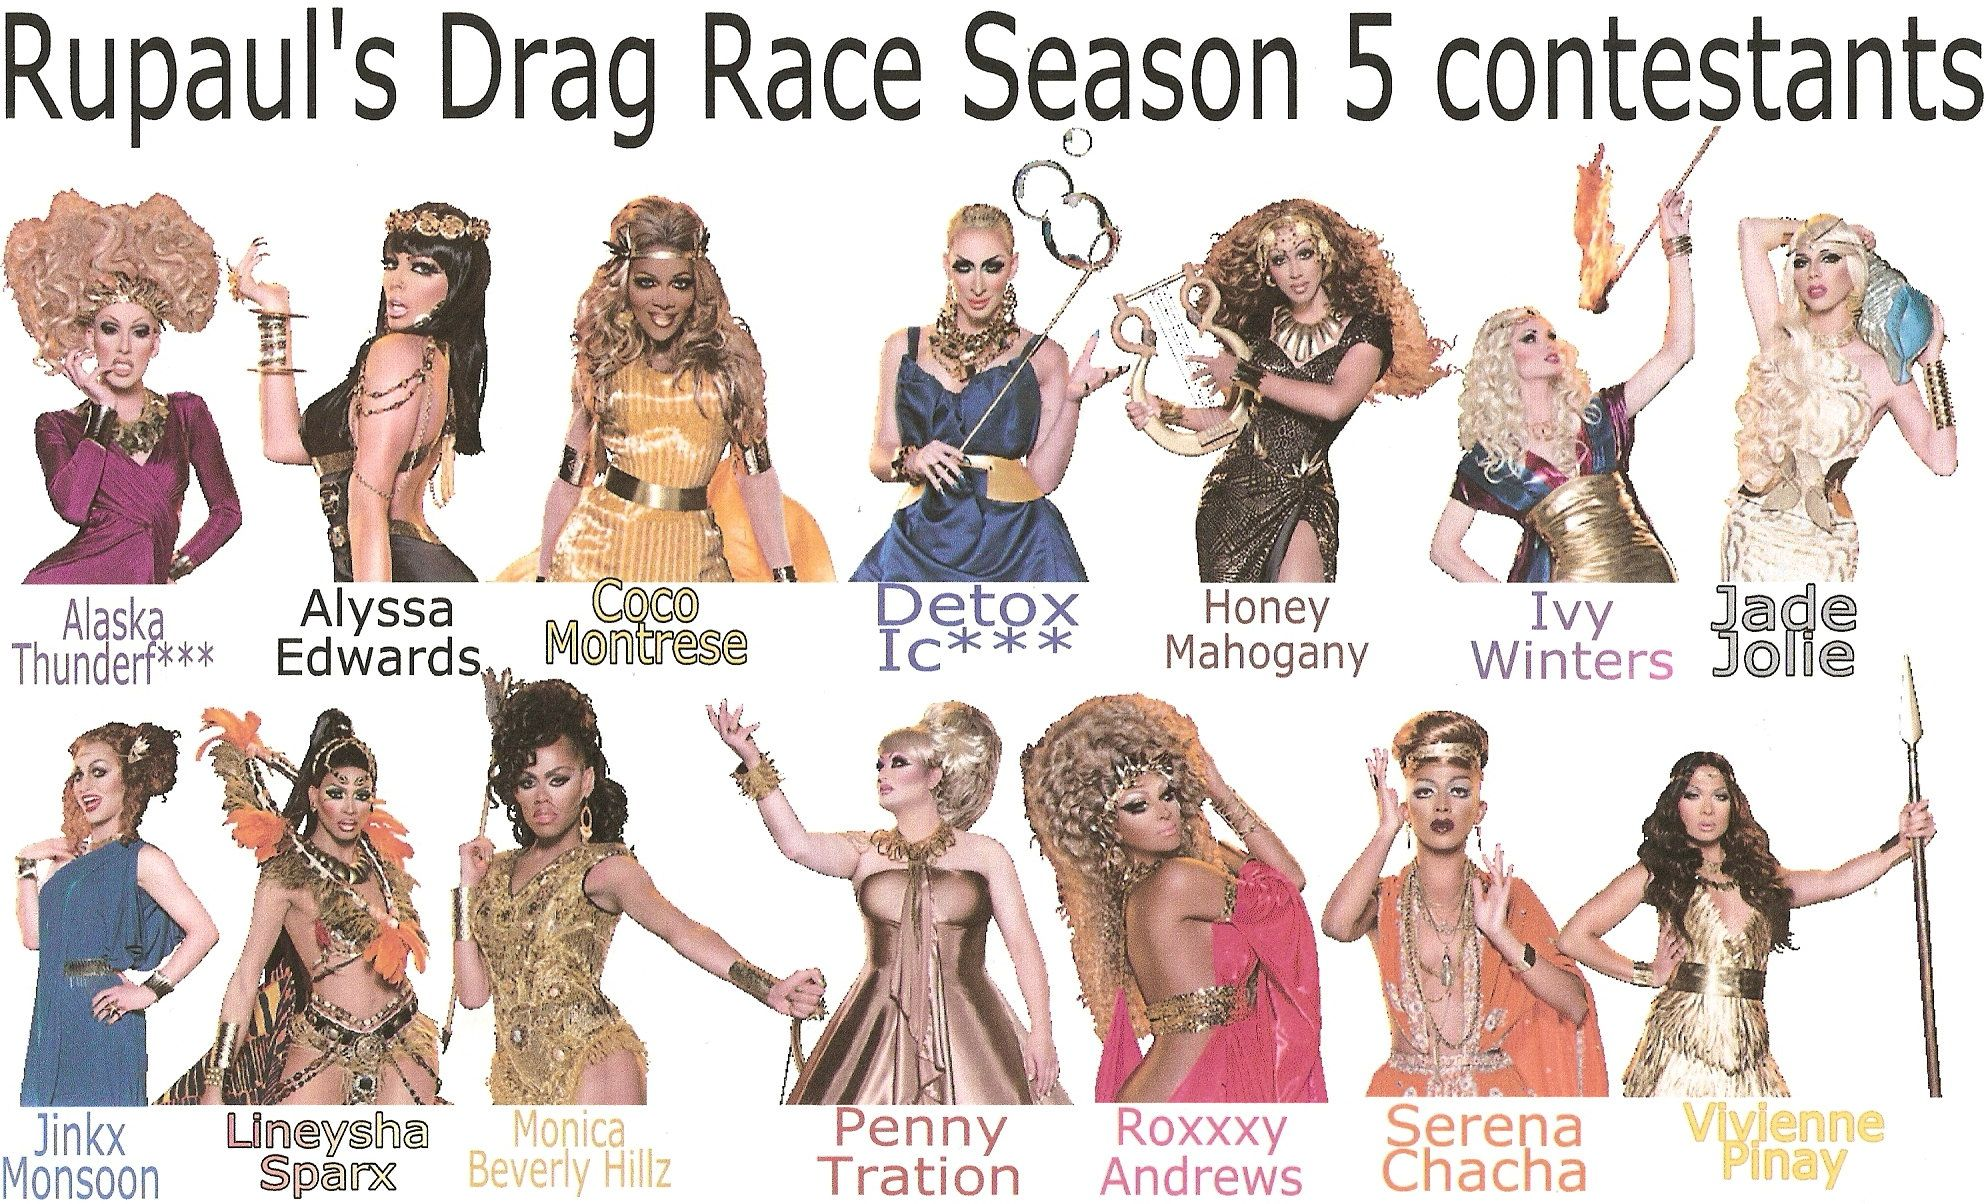 Sneak Peek At The Contestants For Season 5 Of Rupauls -8592